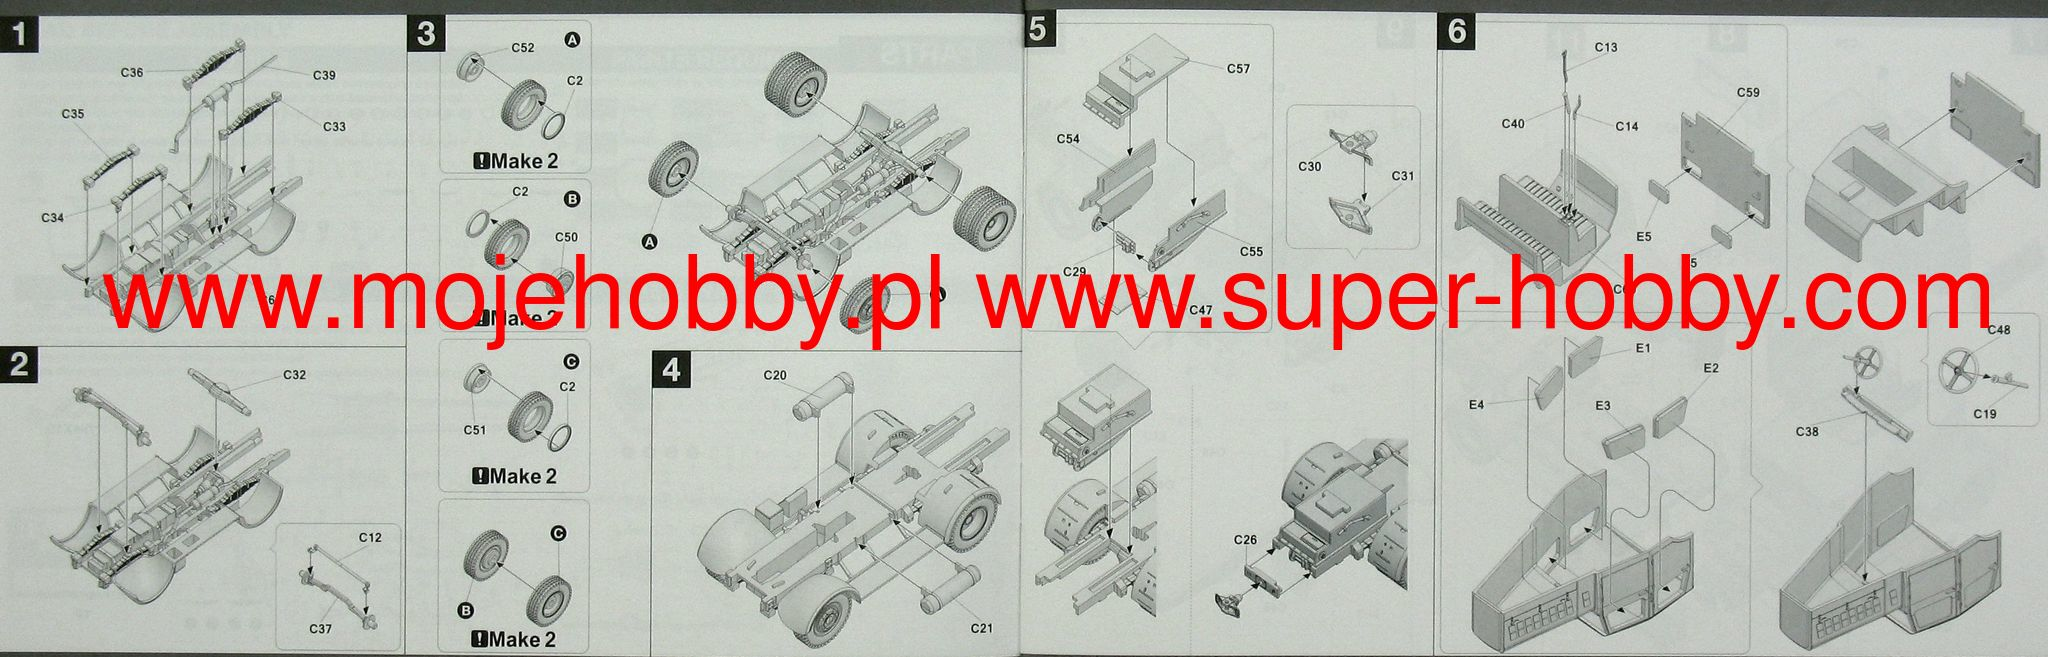 CMK B72100 Wheels for Special Armour Kit Meillerwagen V2 Transporter in 1:72